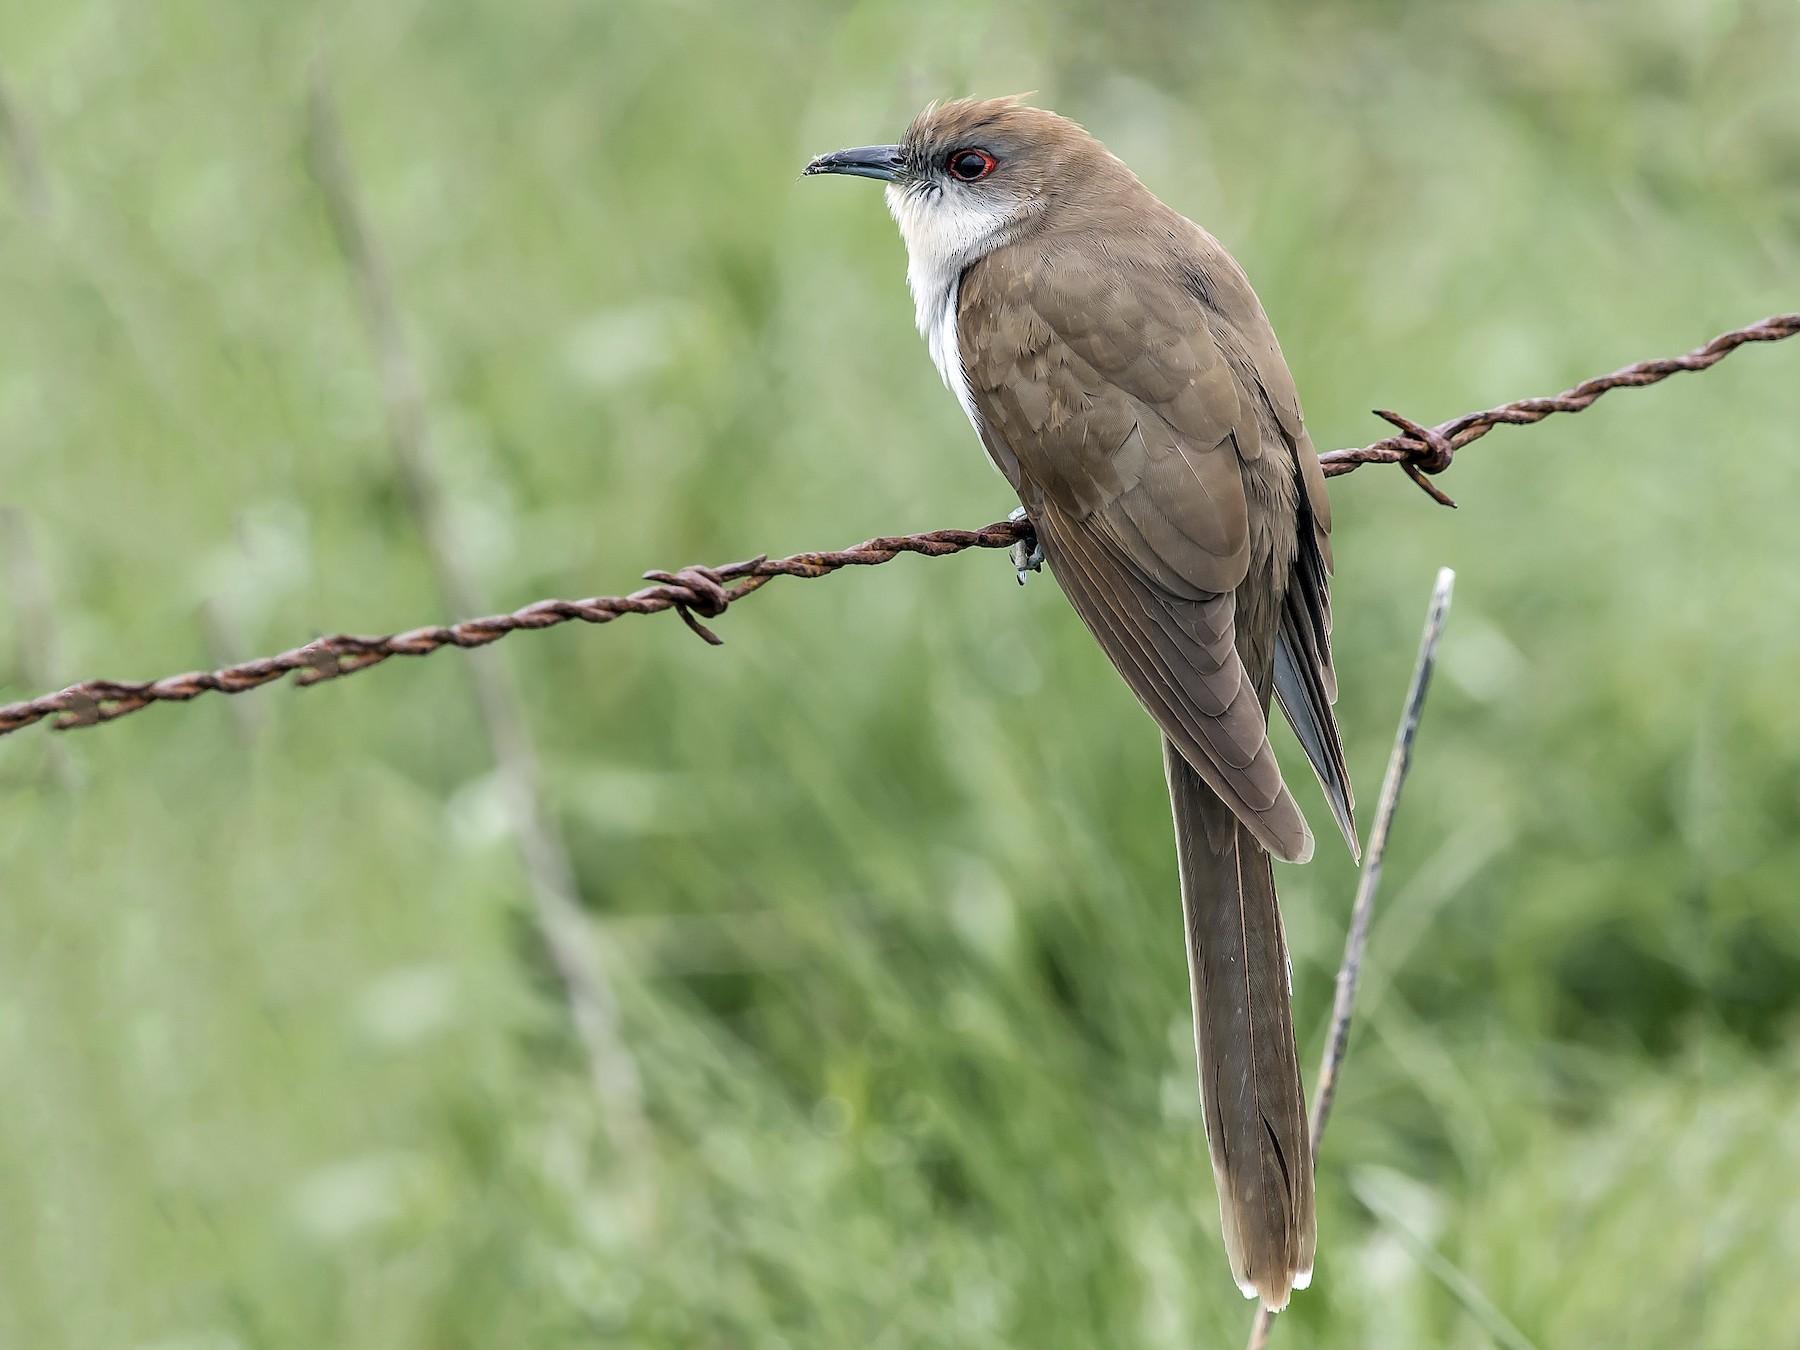 Black-billed Cuckoo - Ronnie d'Entremont